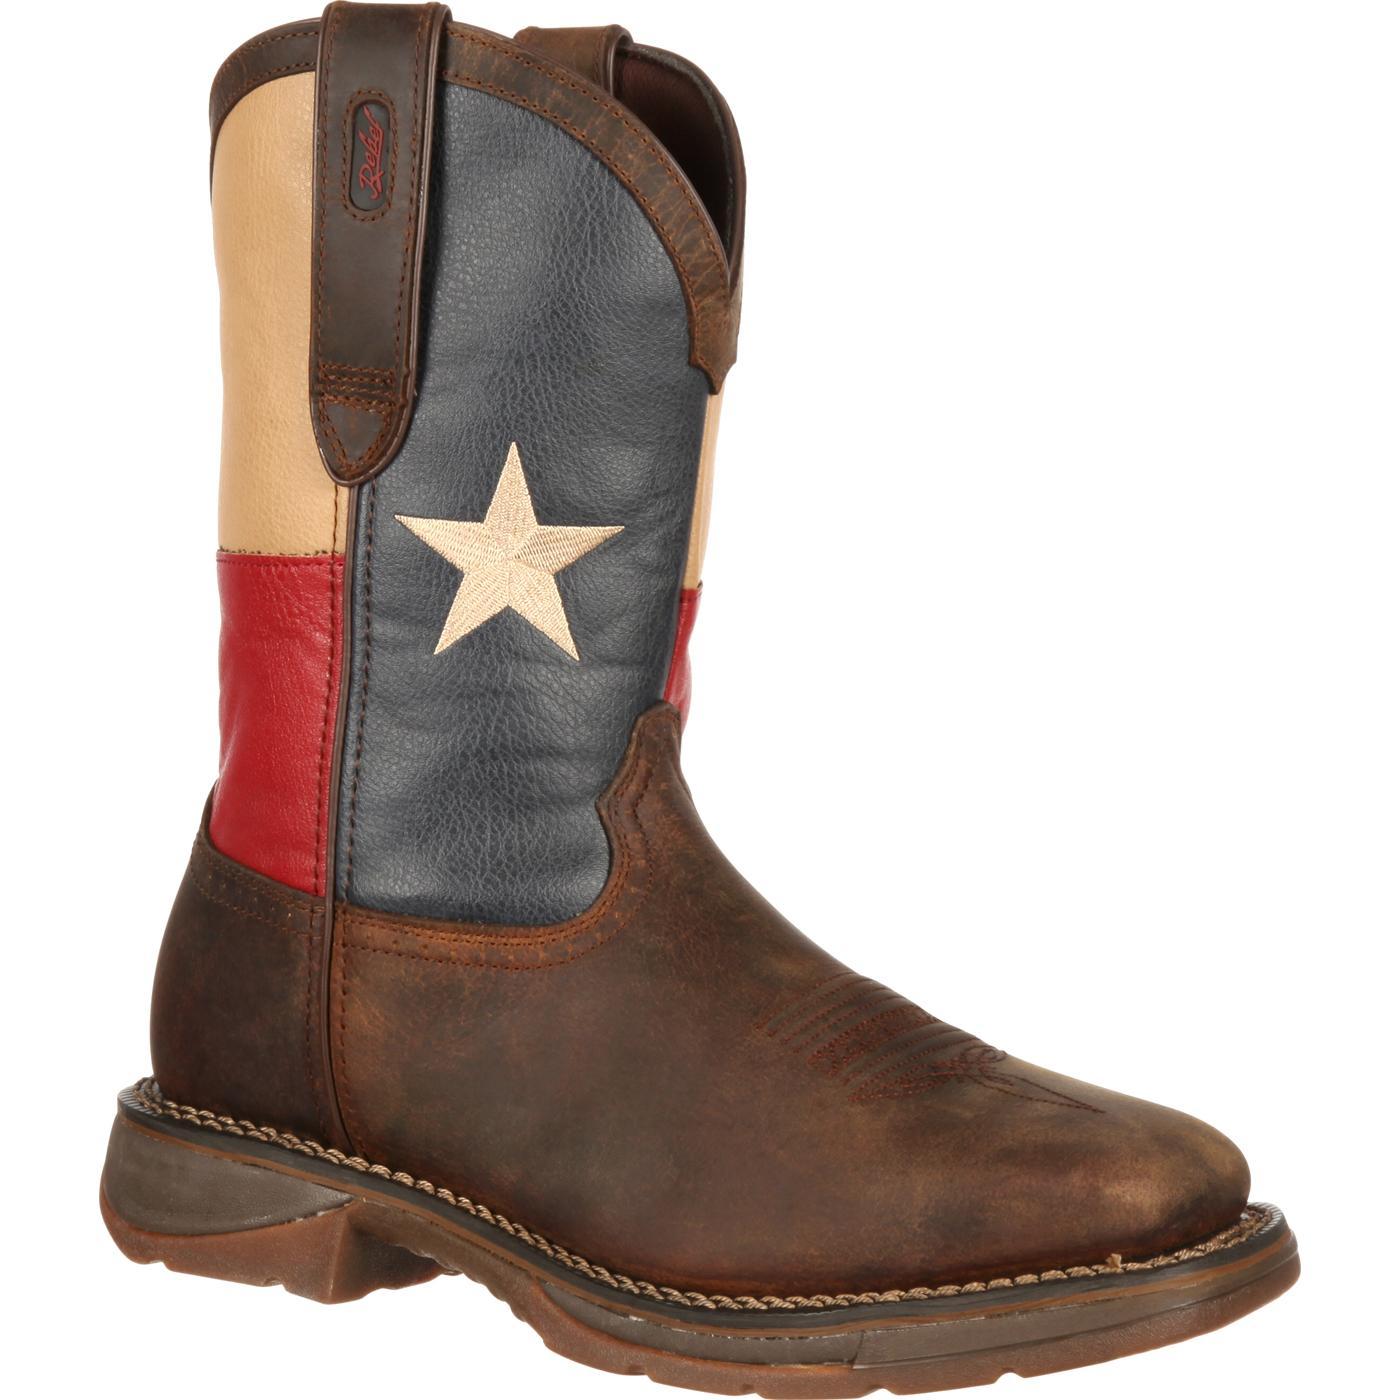 30c9ad97cde Rebel by Durango Steel Toe Texas Flag Western Boot